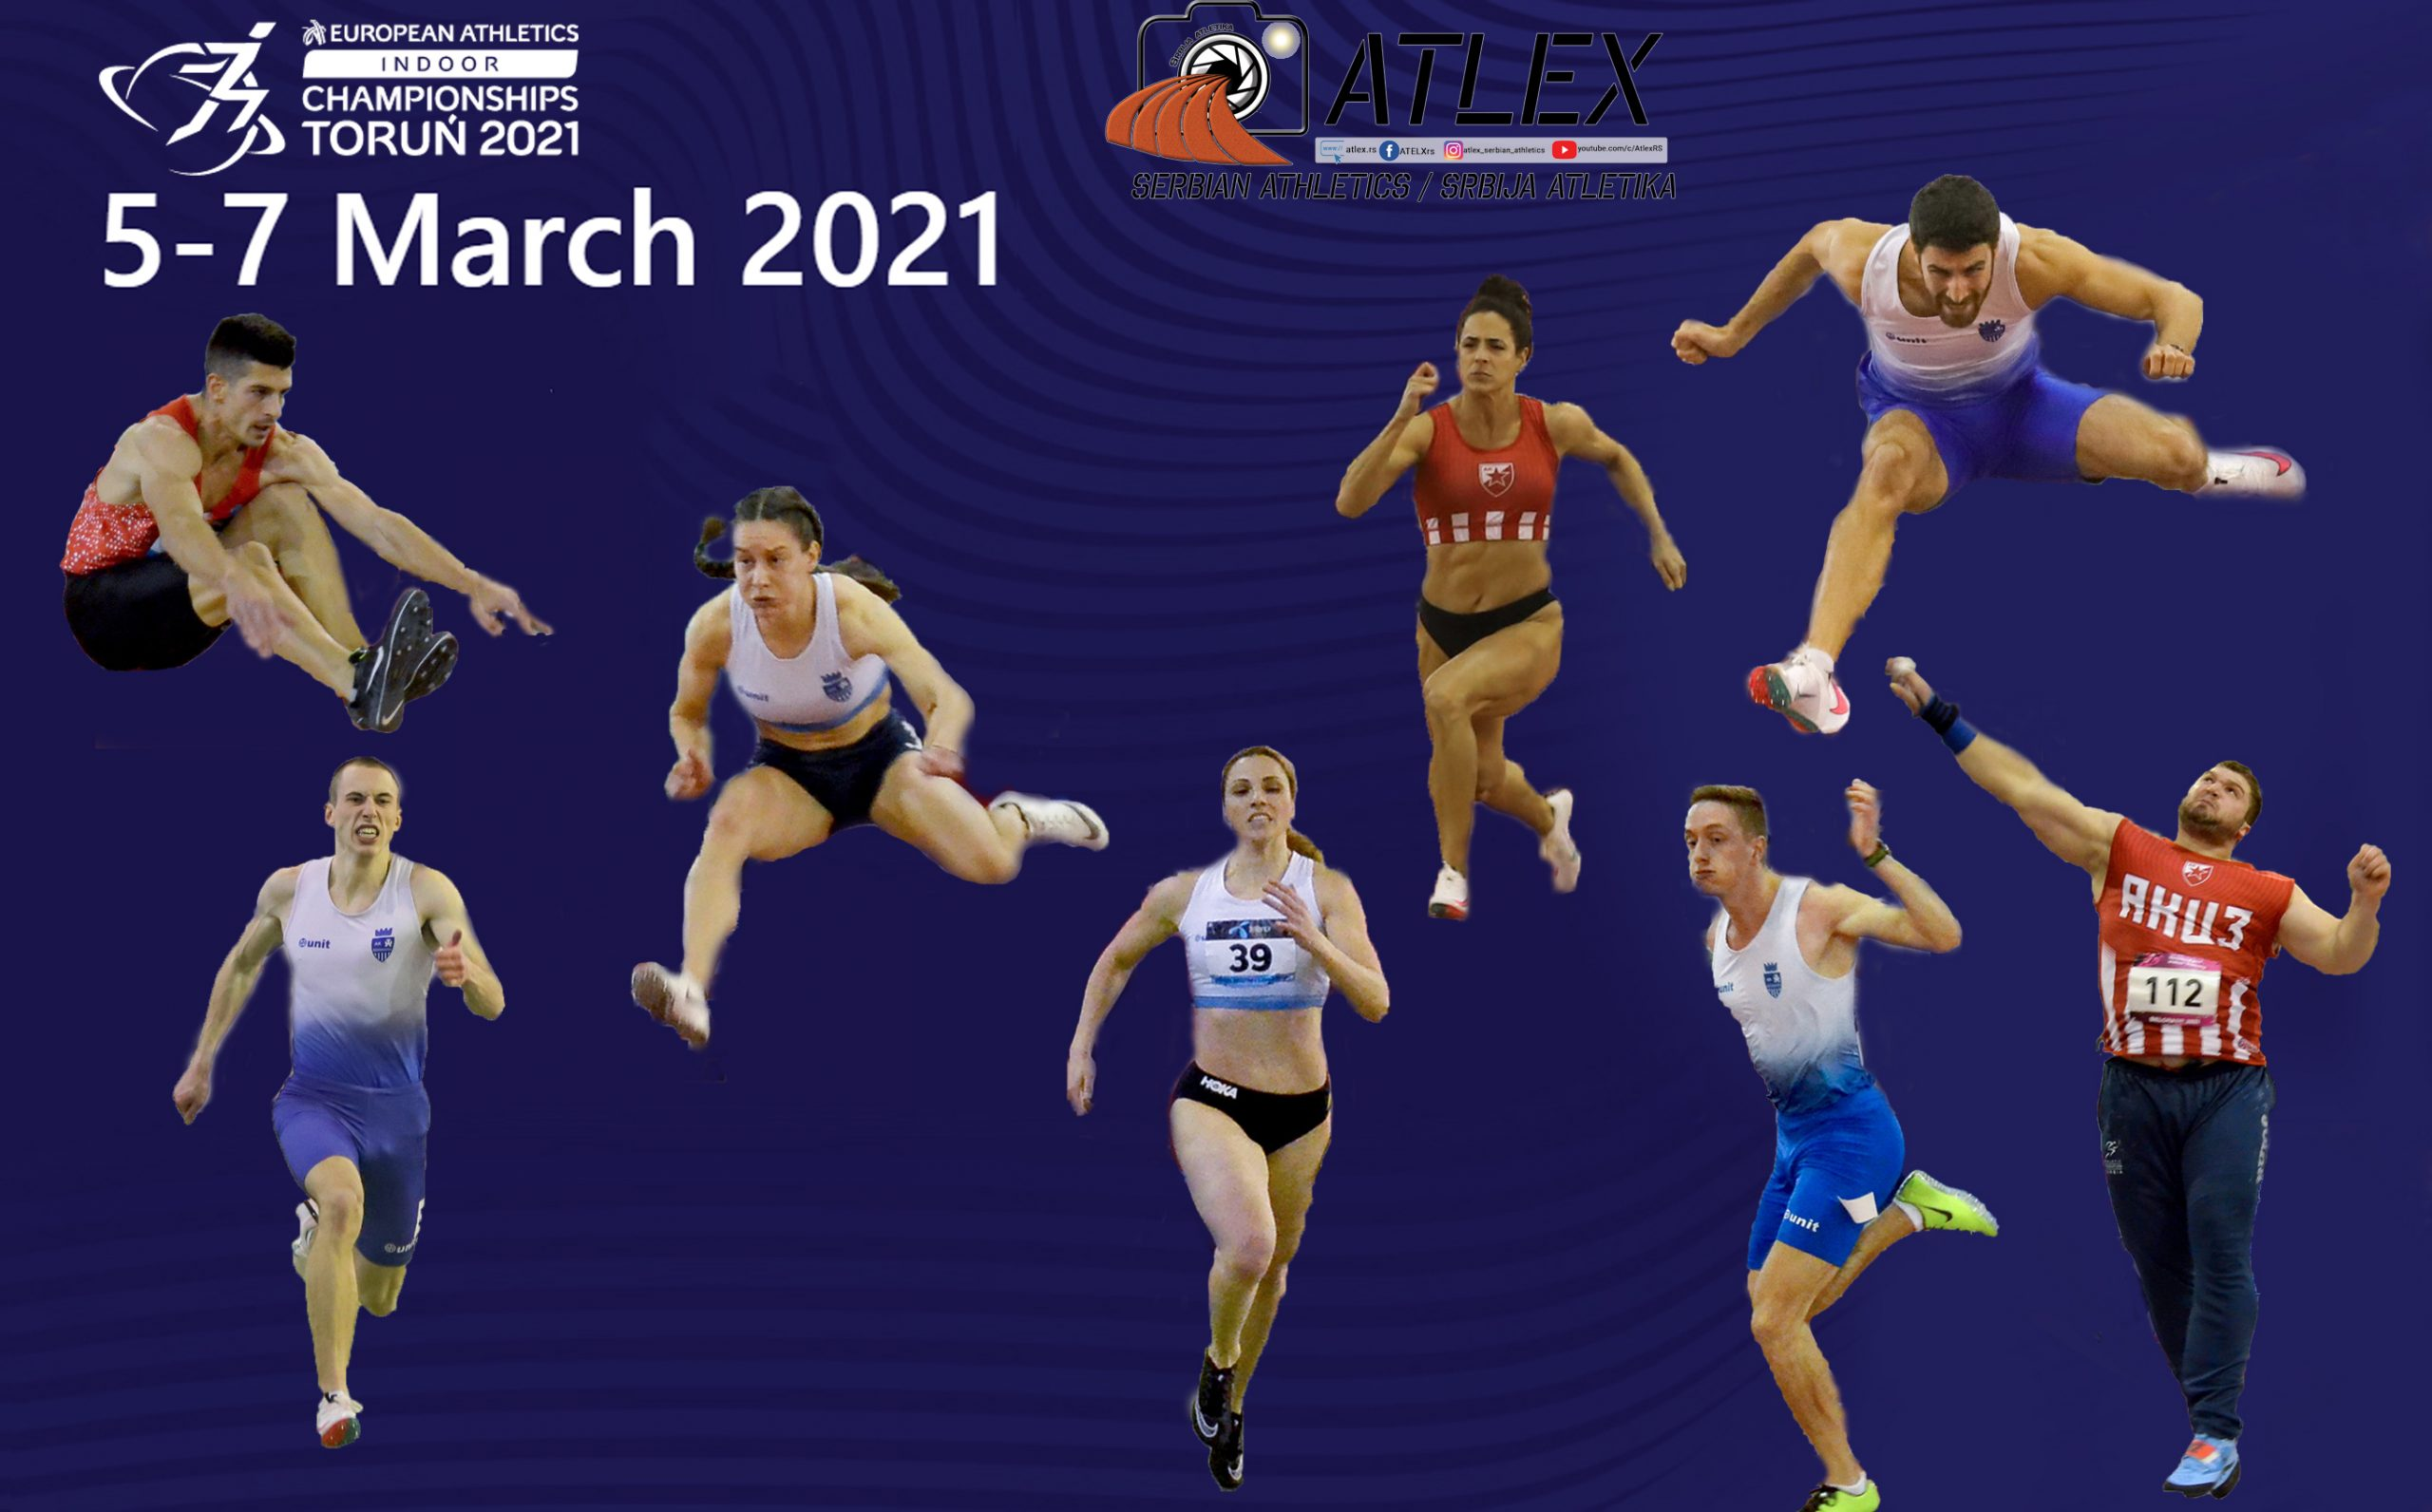 Torunj 2021 - plakat srpski reprezentativci